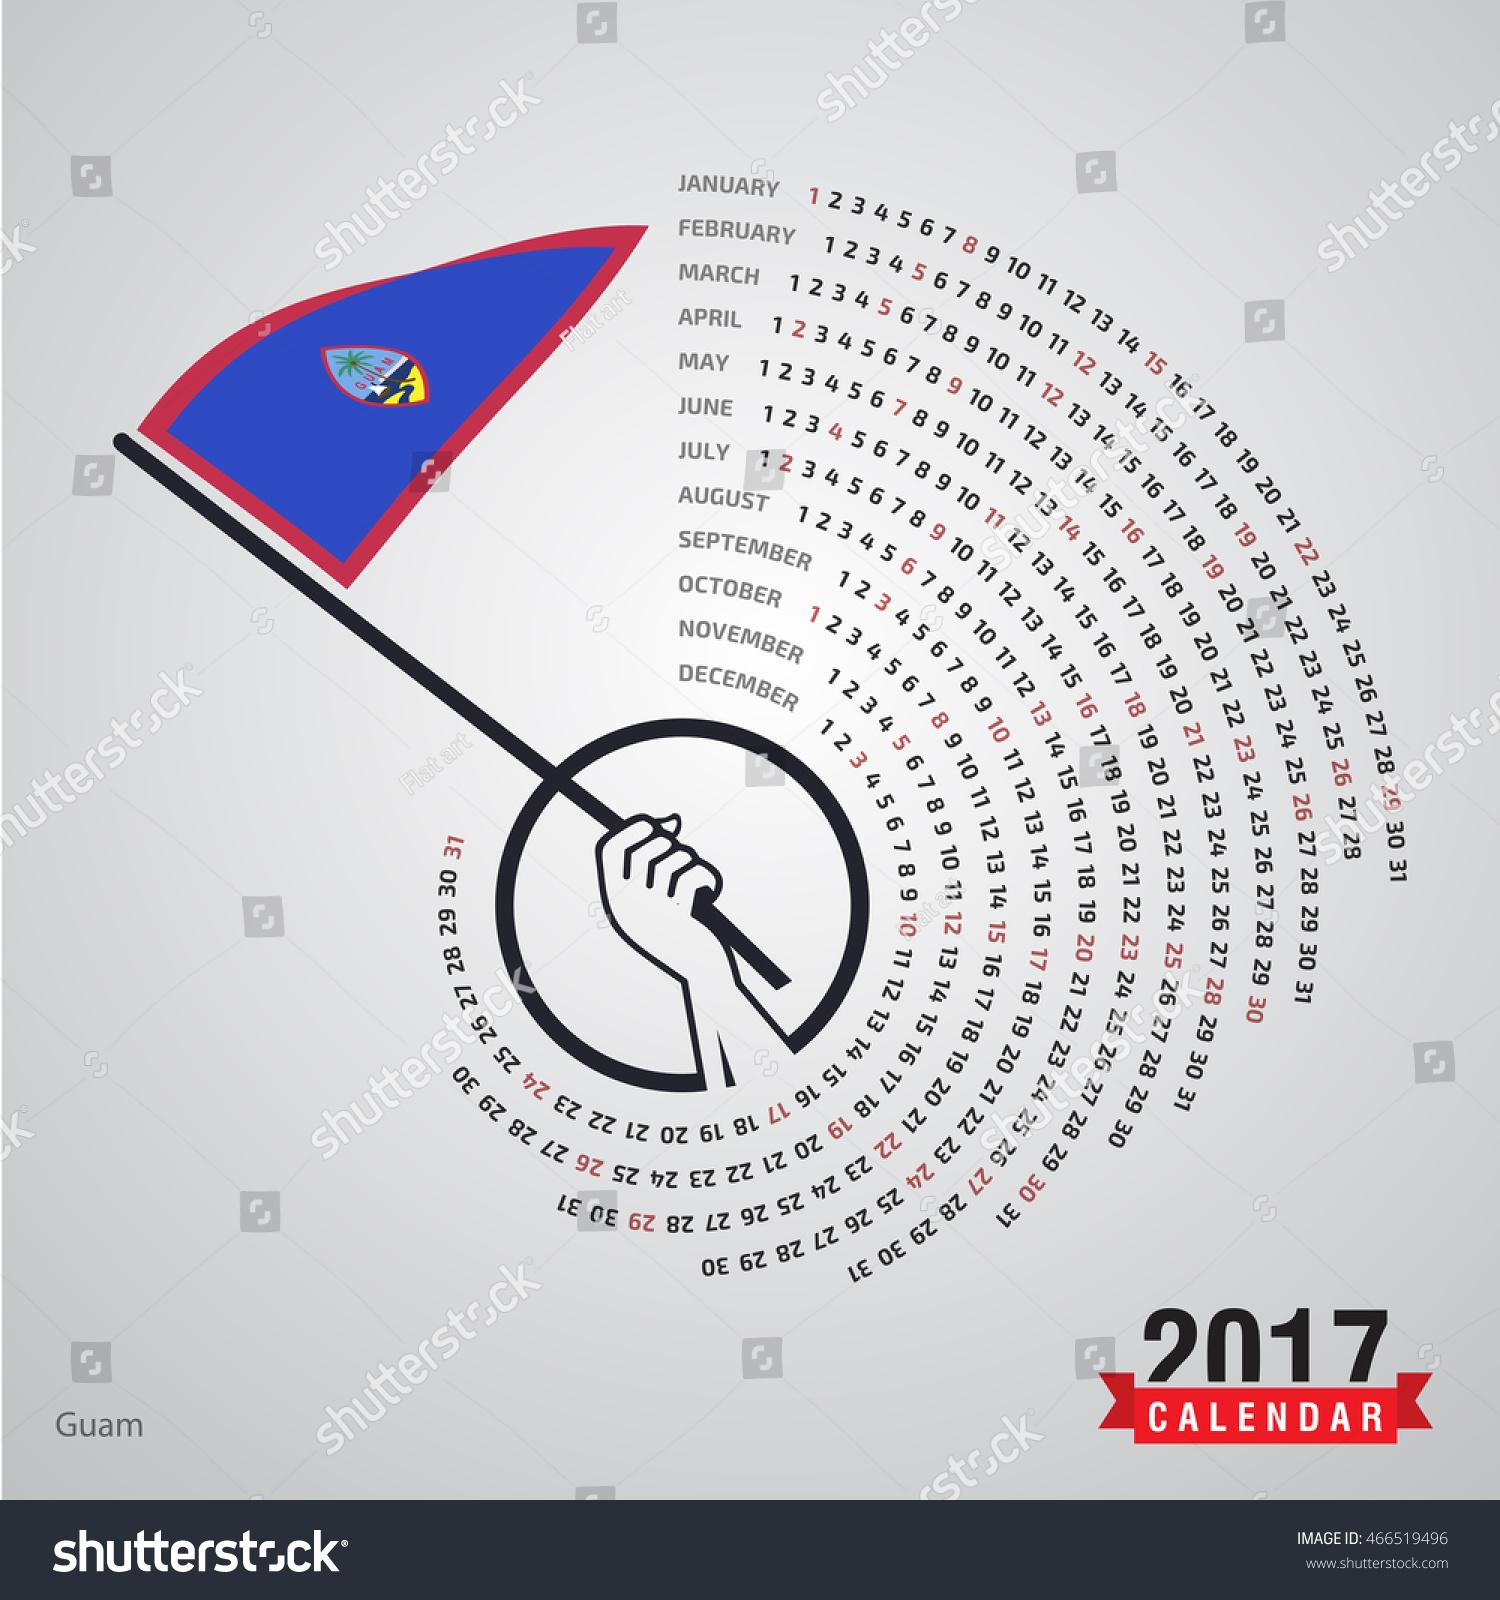 Calendar Illustration Search : Calendar guam country waving flag banner spiral